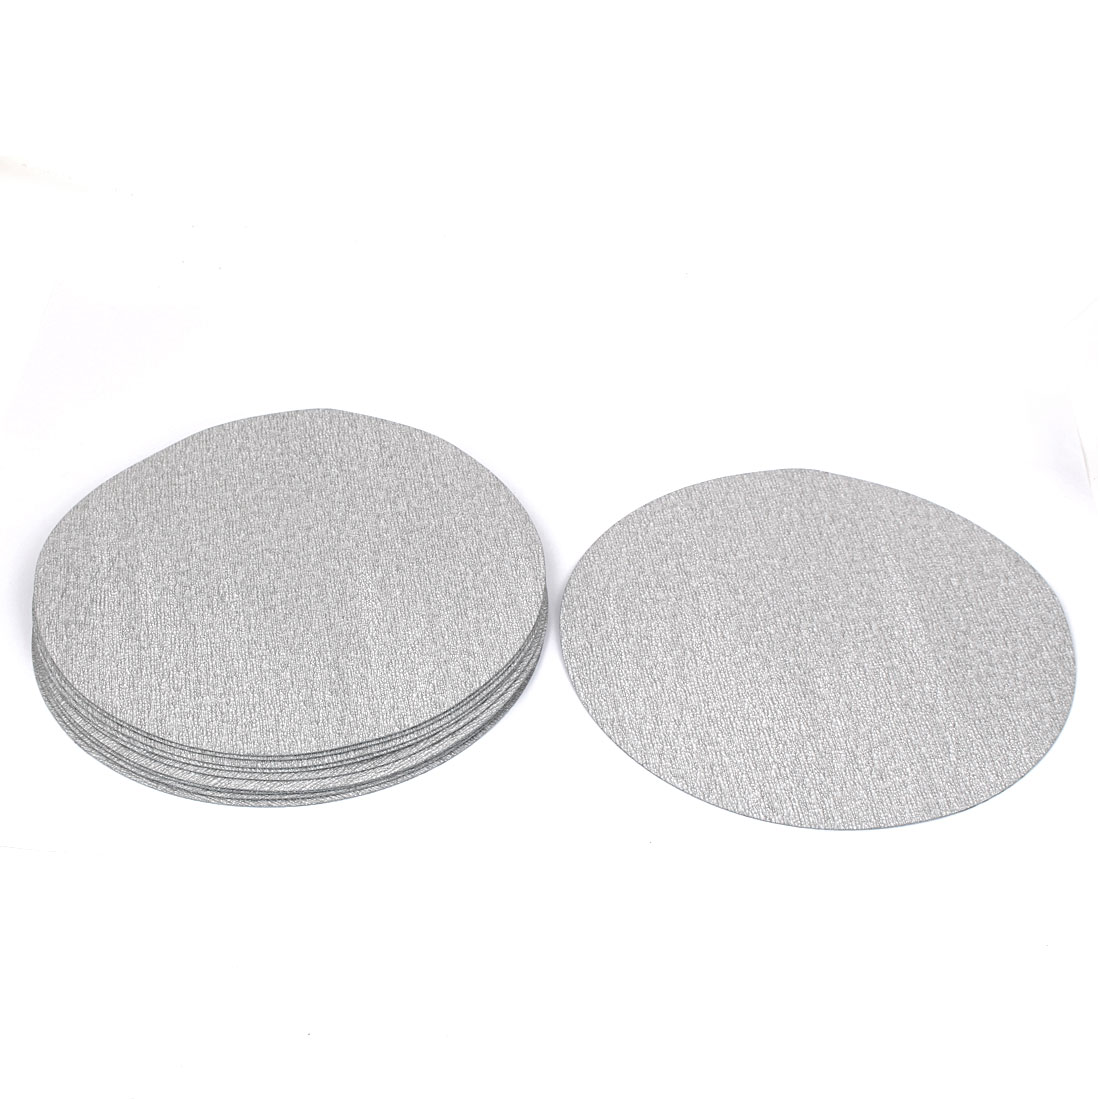 "7"" Dia Polishing Round Dry Abrasive Sanding Sandpaper Sheet Disc 1000 Grit 10 Pcs"